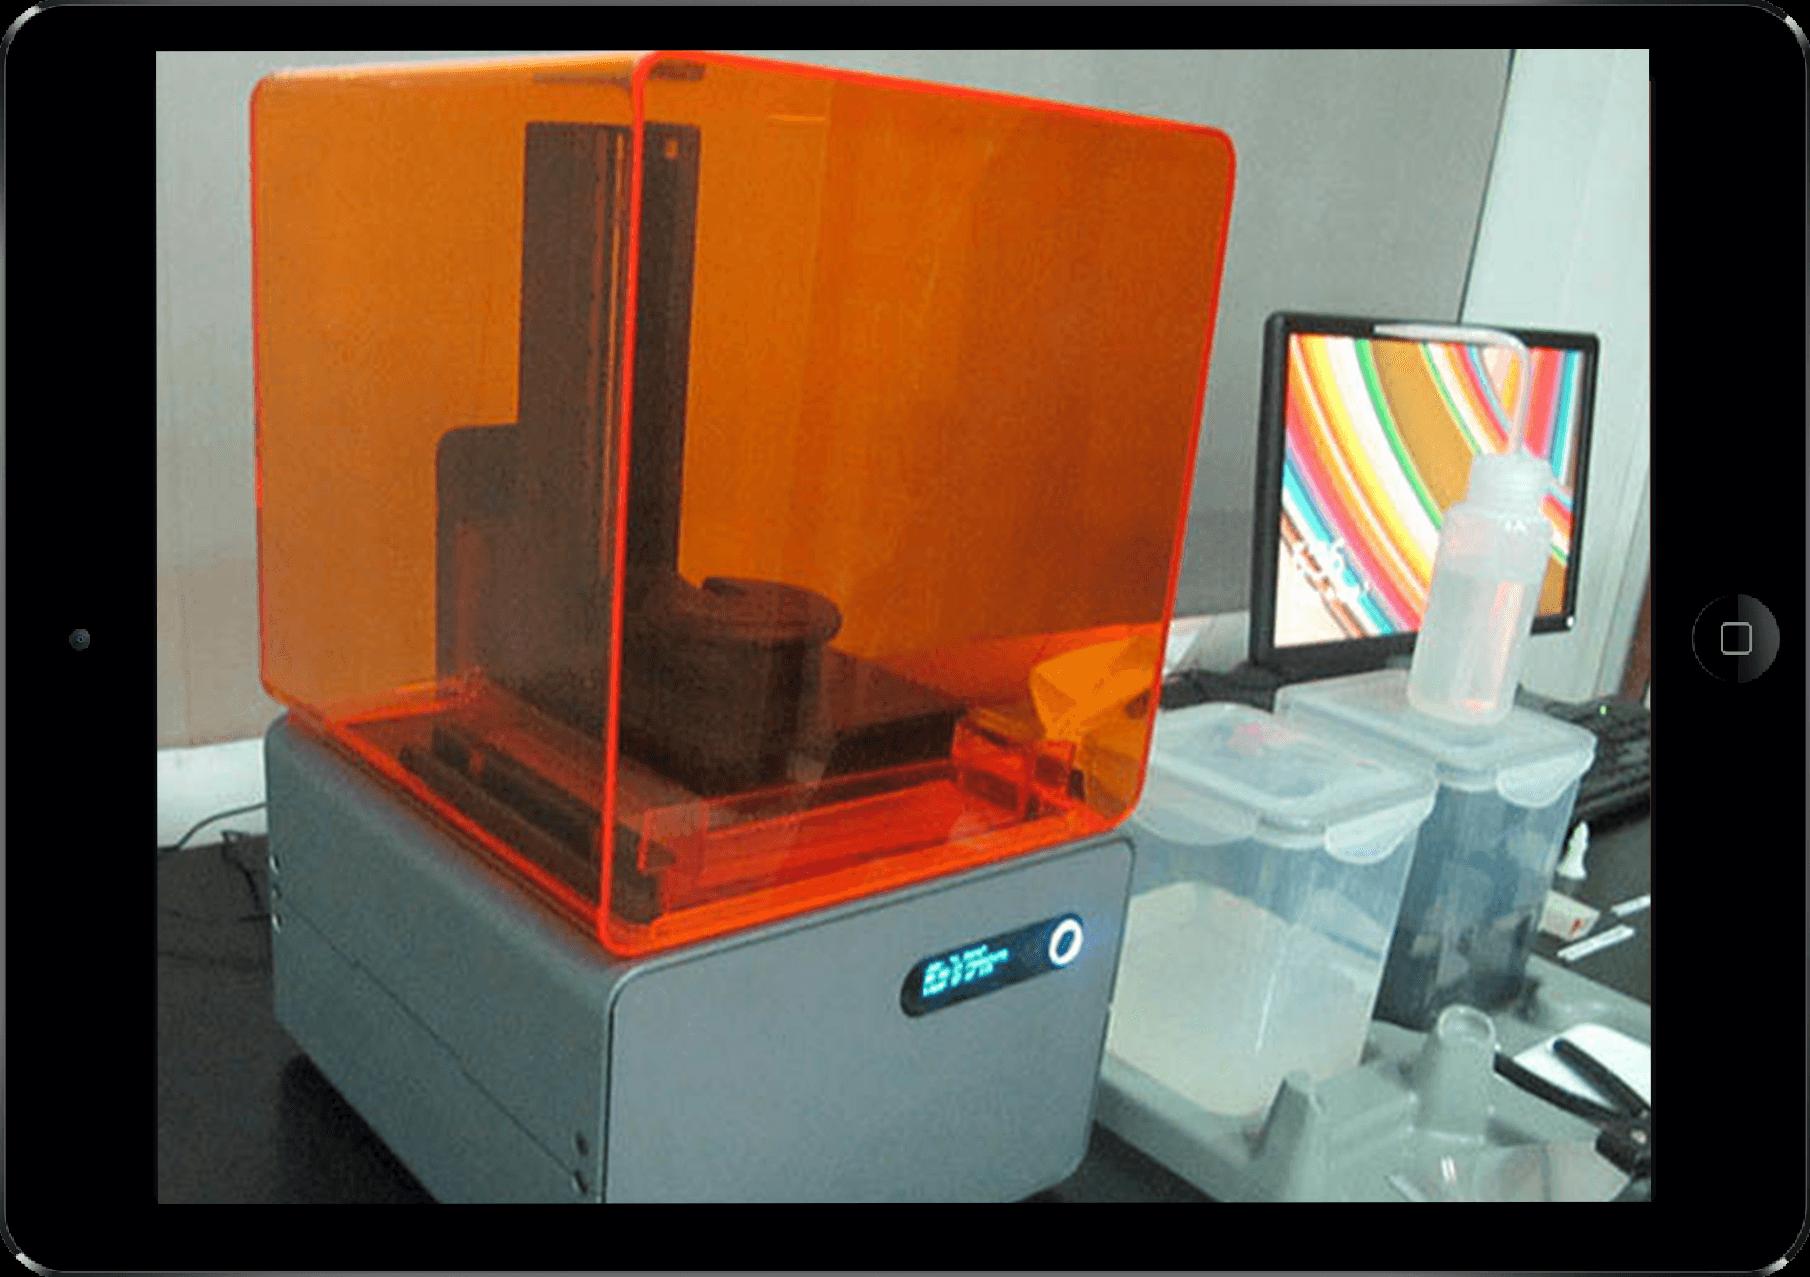 formlabs 3d printer software